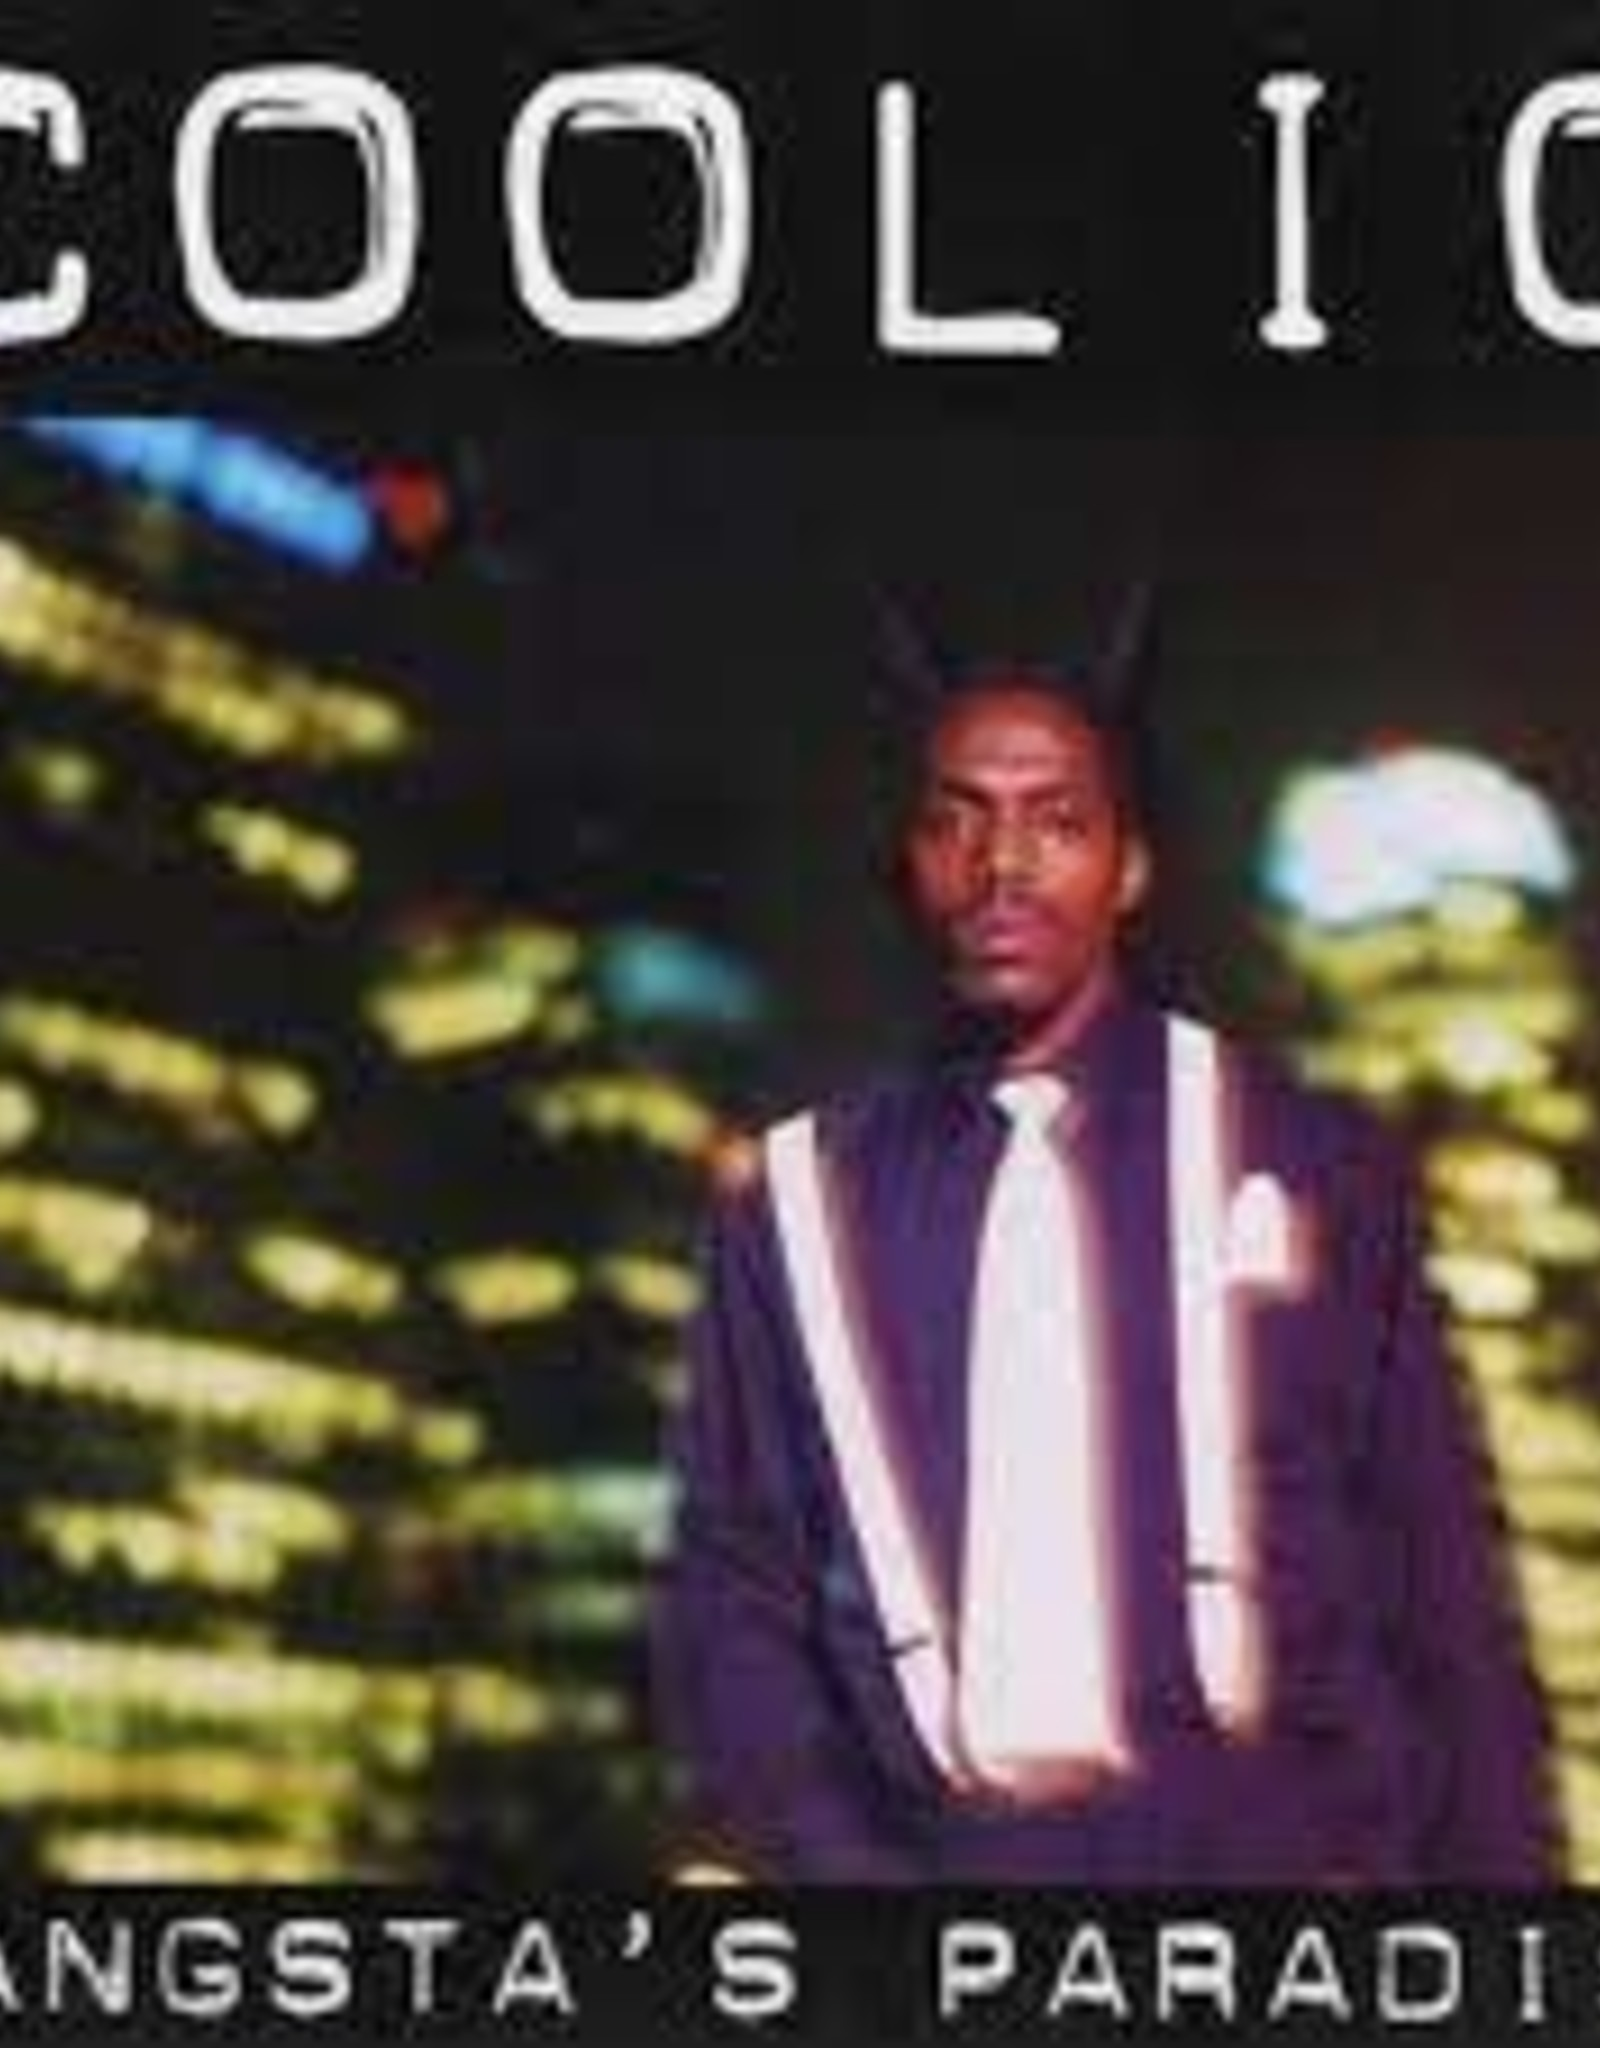 Coolio - Gangsta's Paradise (25TH Anniversary - Remastered) (2LP/180G/RED Vinyl) (RSD 2020)